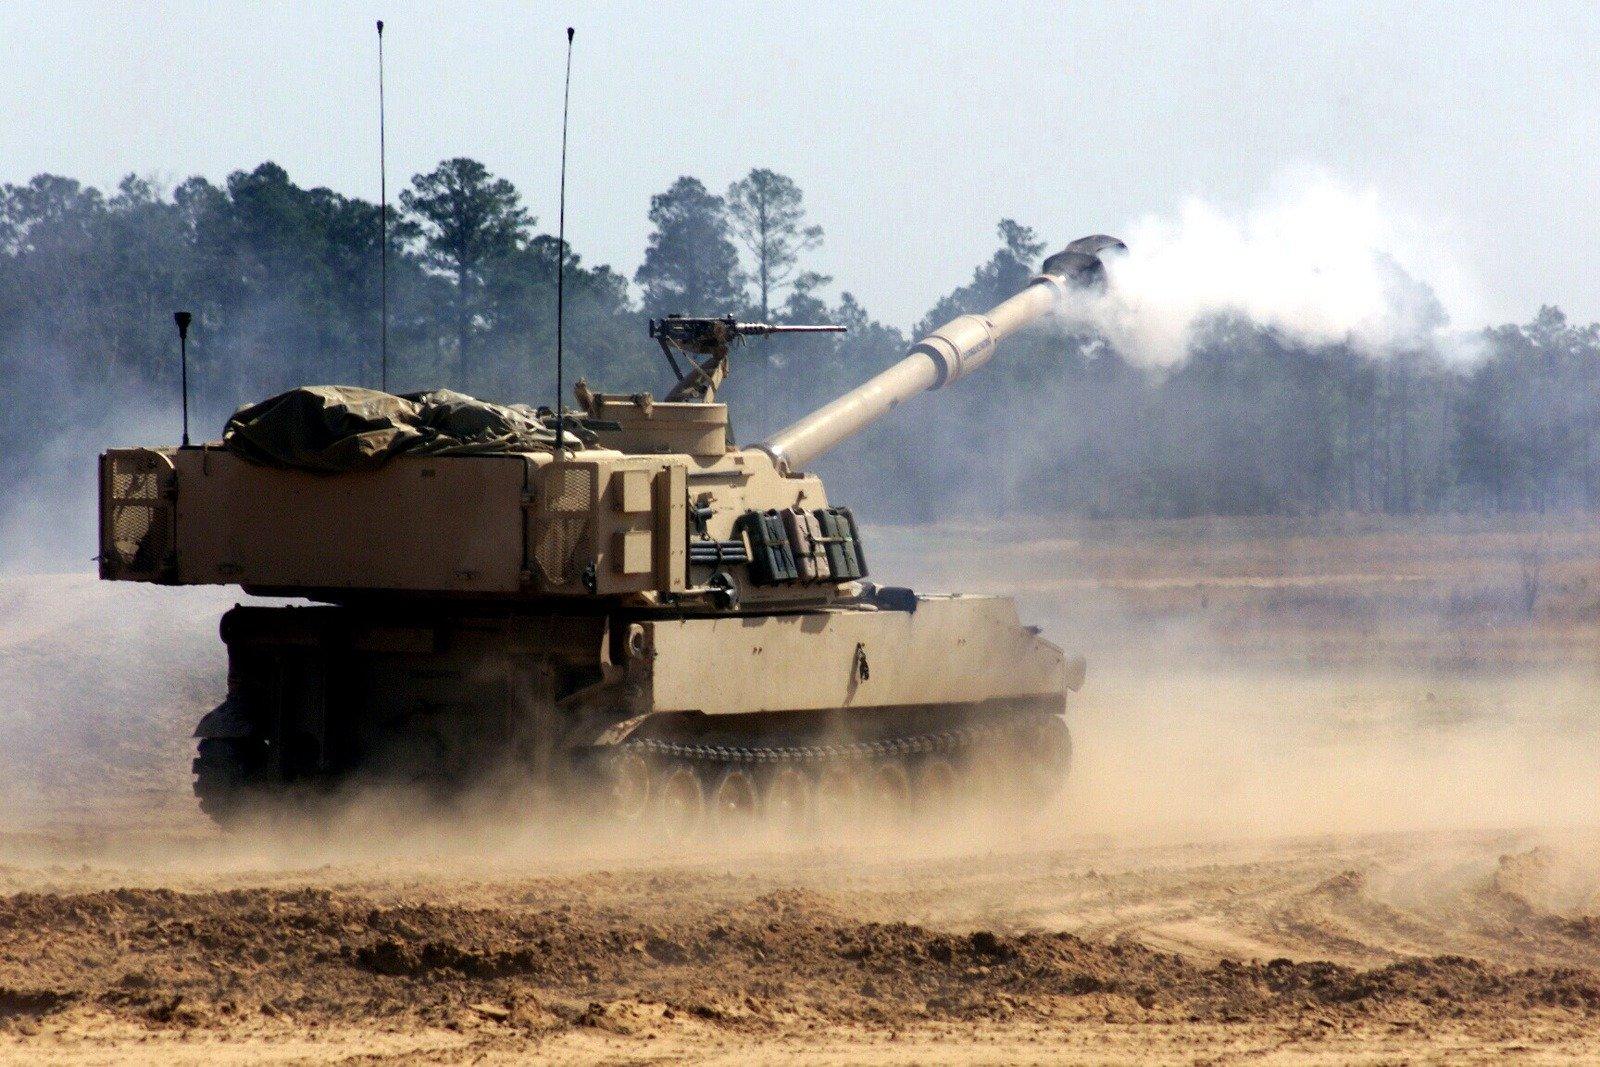 M109A7 Paladin 155mm kundağı motorlu topçu sistemi/obüs